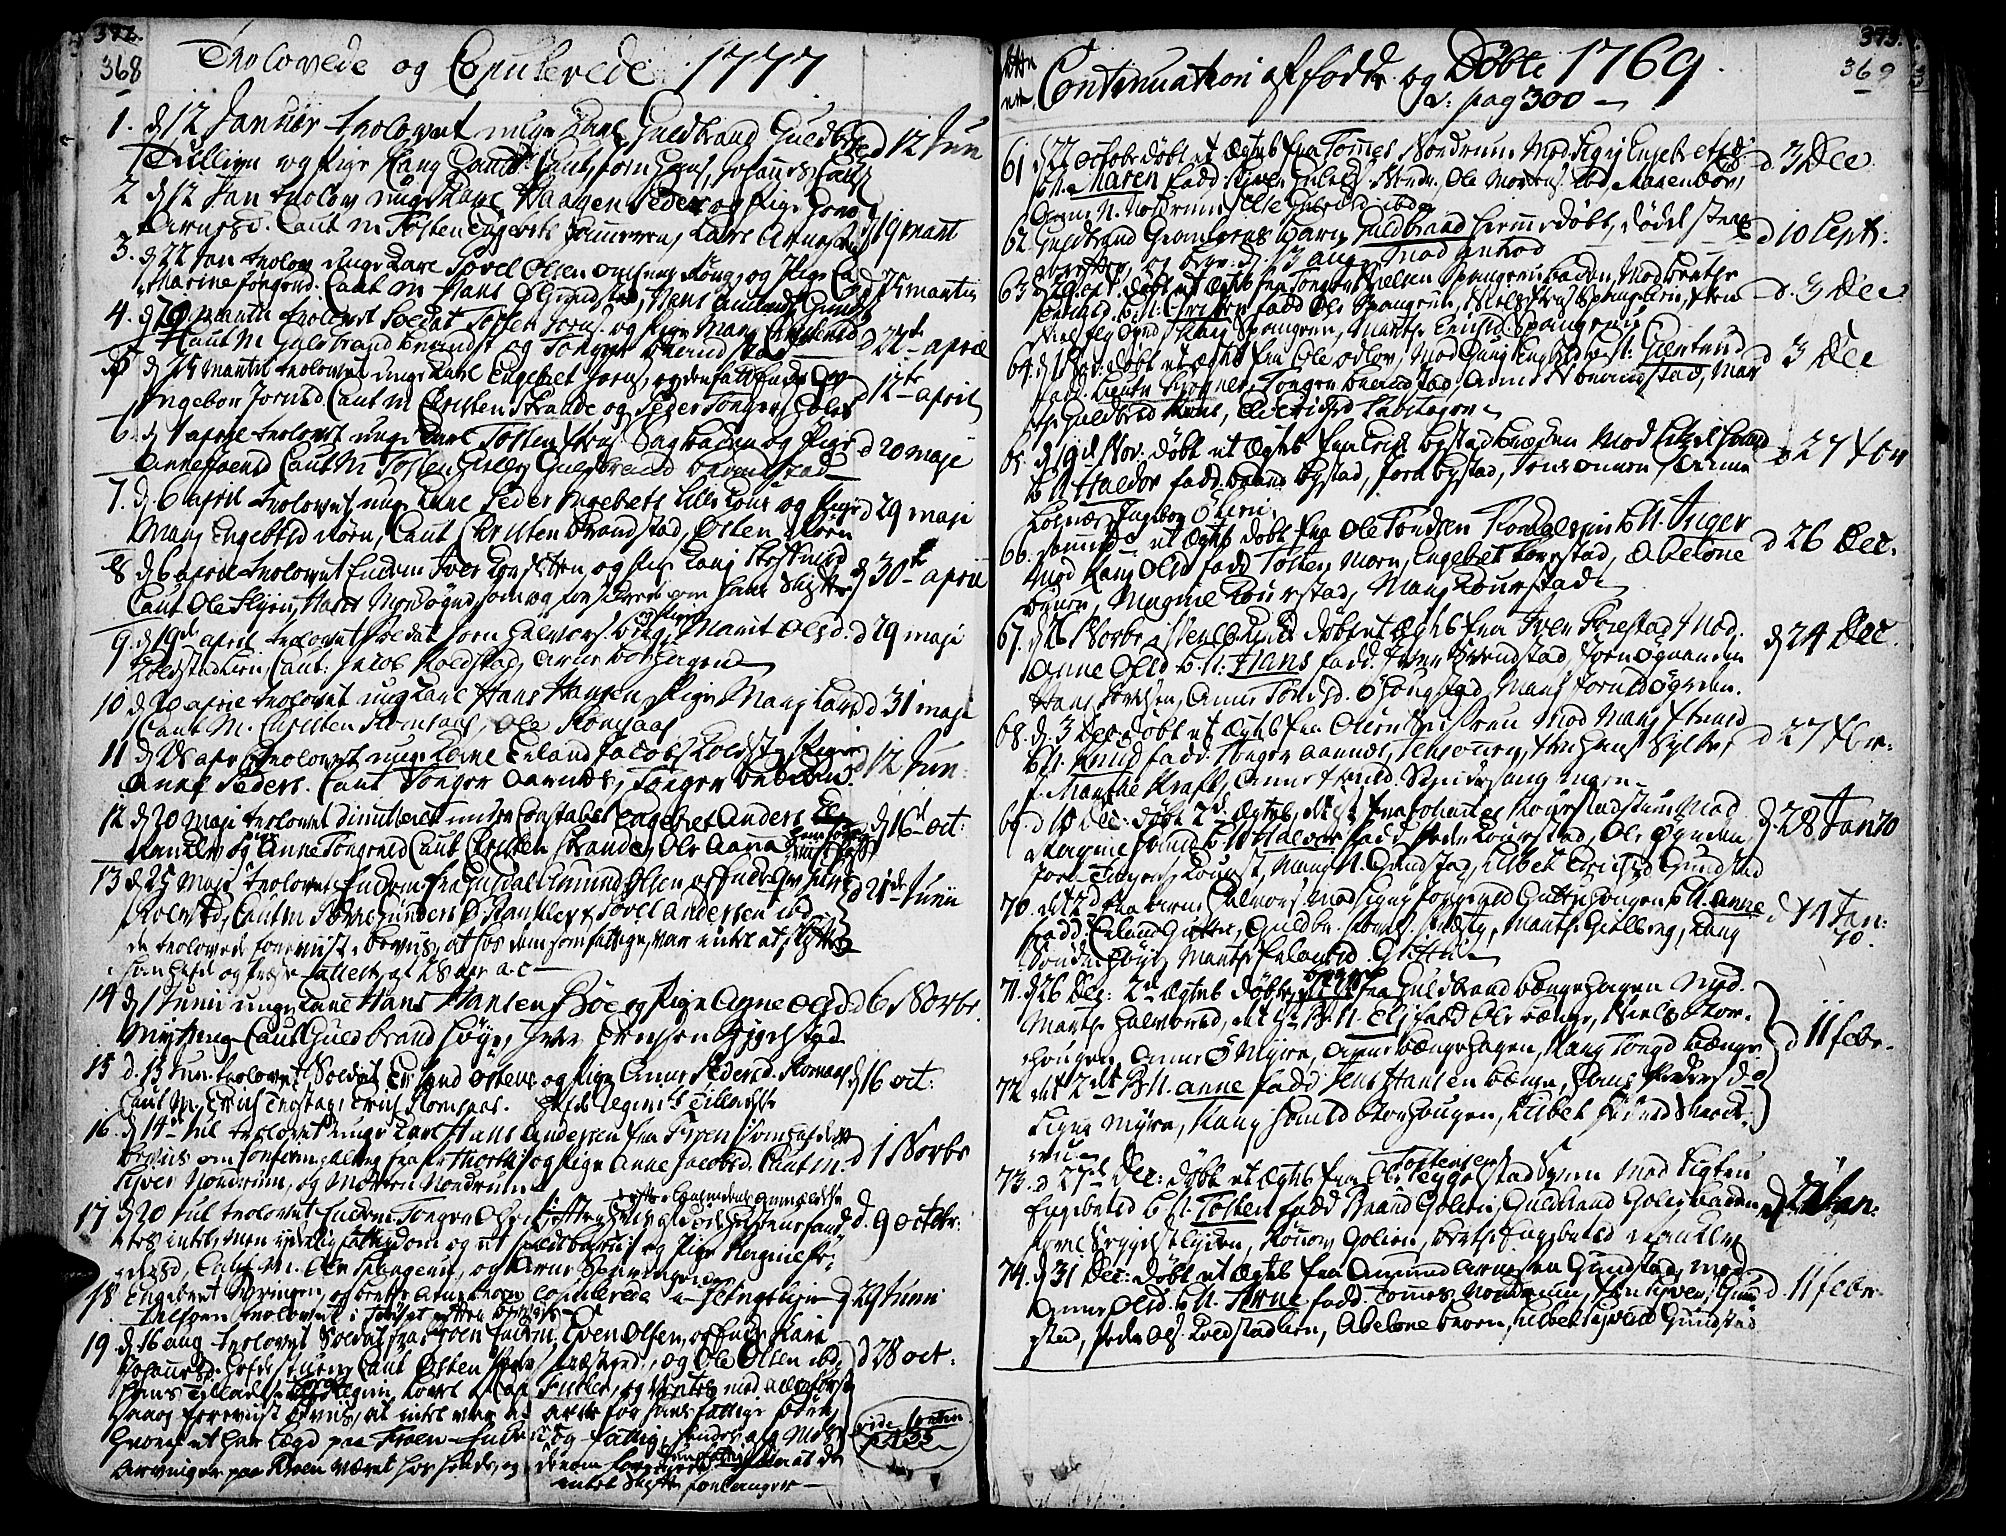 SAH, Ringebu prestekontor, Ministerialbok nr. 2, 1734-1780, s. 368-369